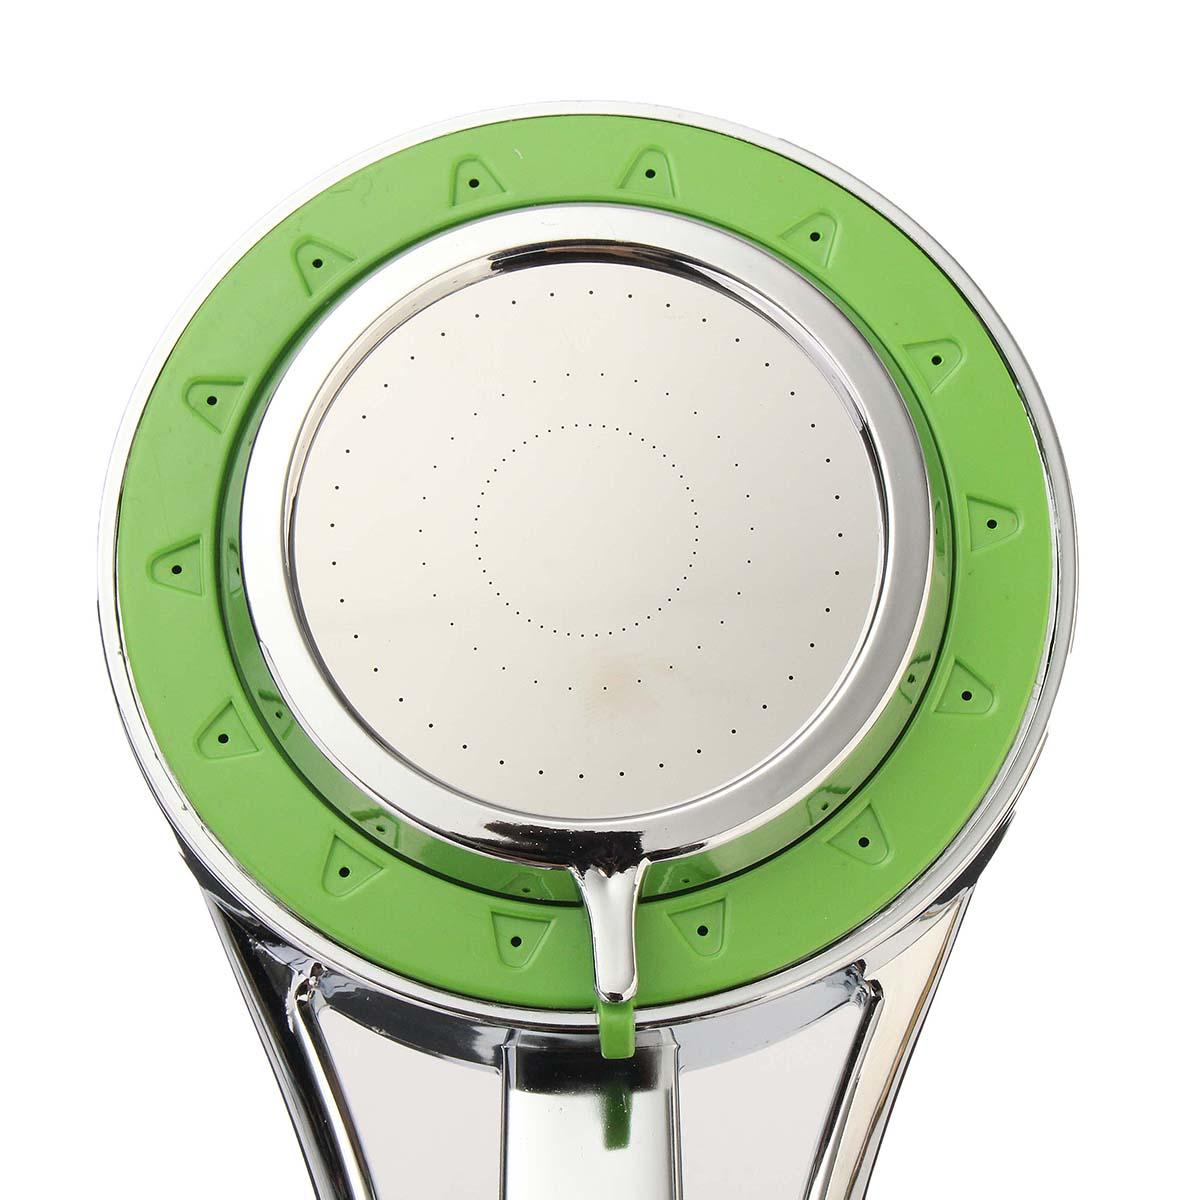 Water Saving Shower Head 3 Modes ABS Bathroom Handheld Chrome ...